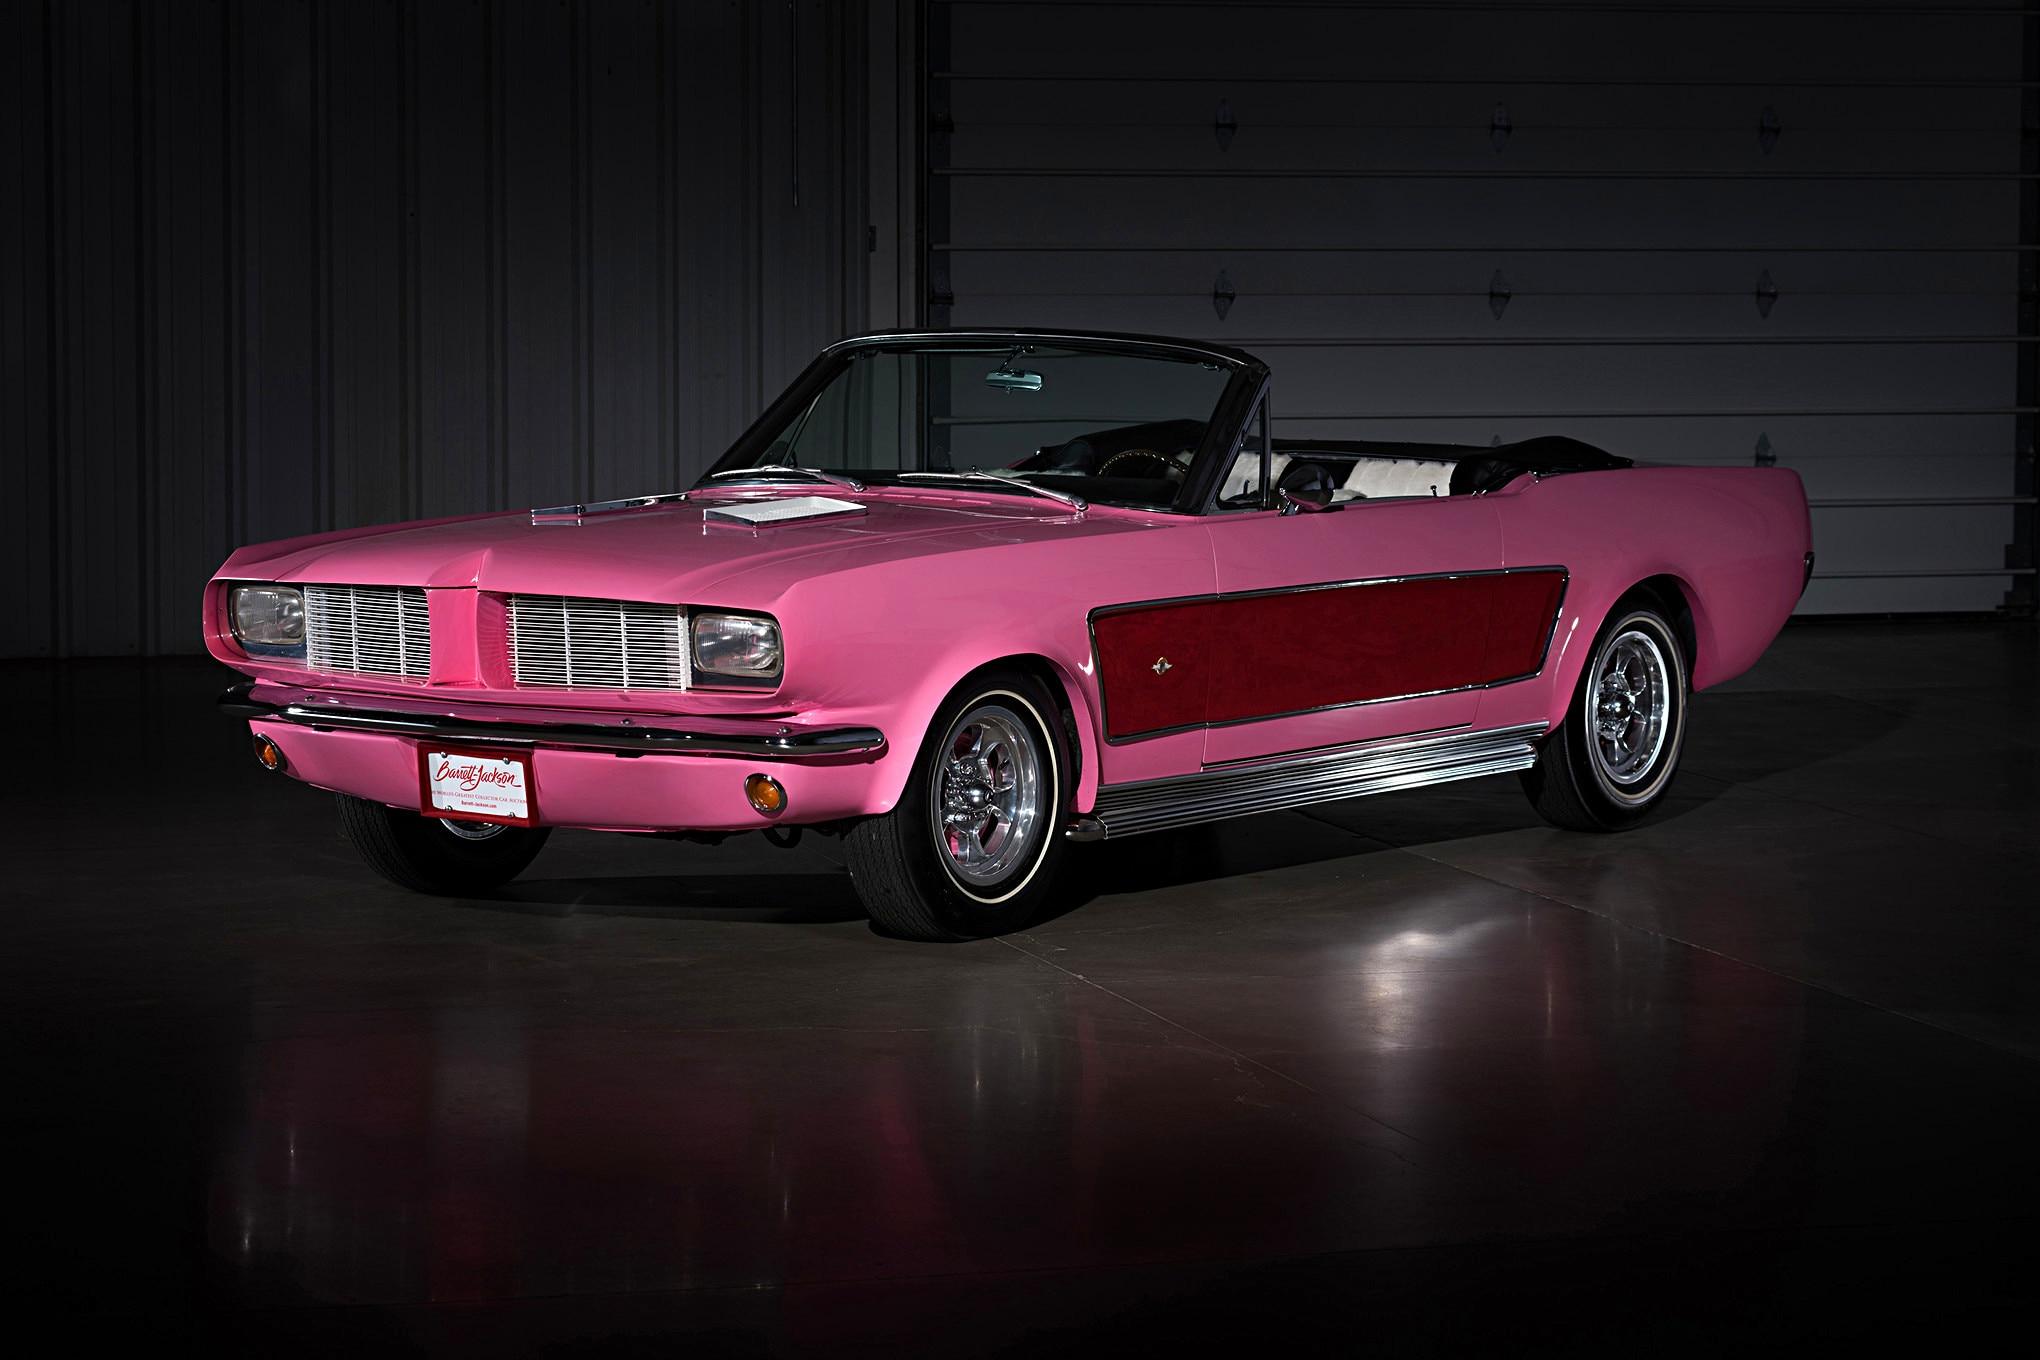 Sonny Cher Ford Mustang Front Quarter